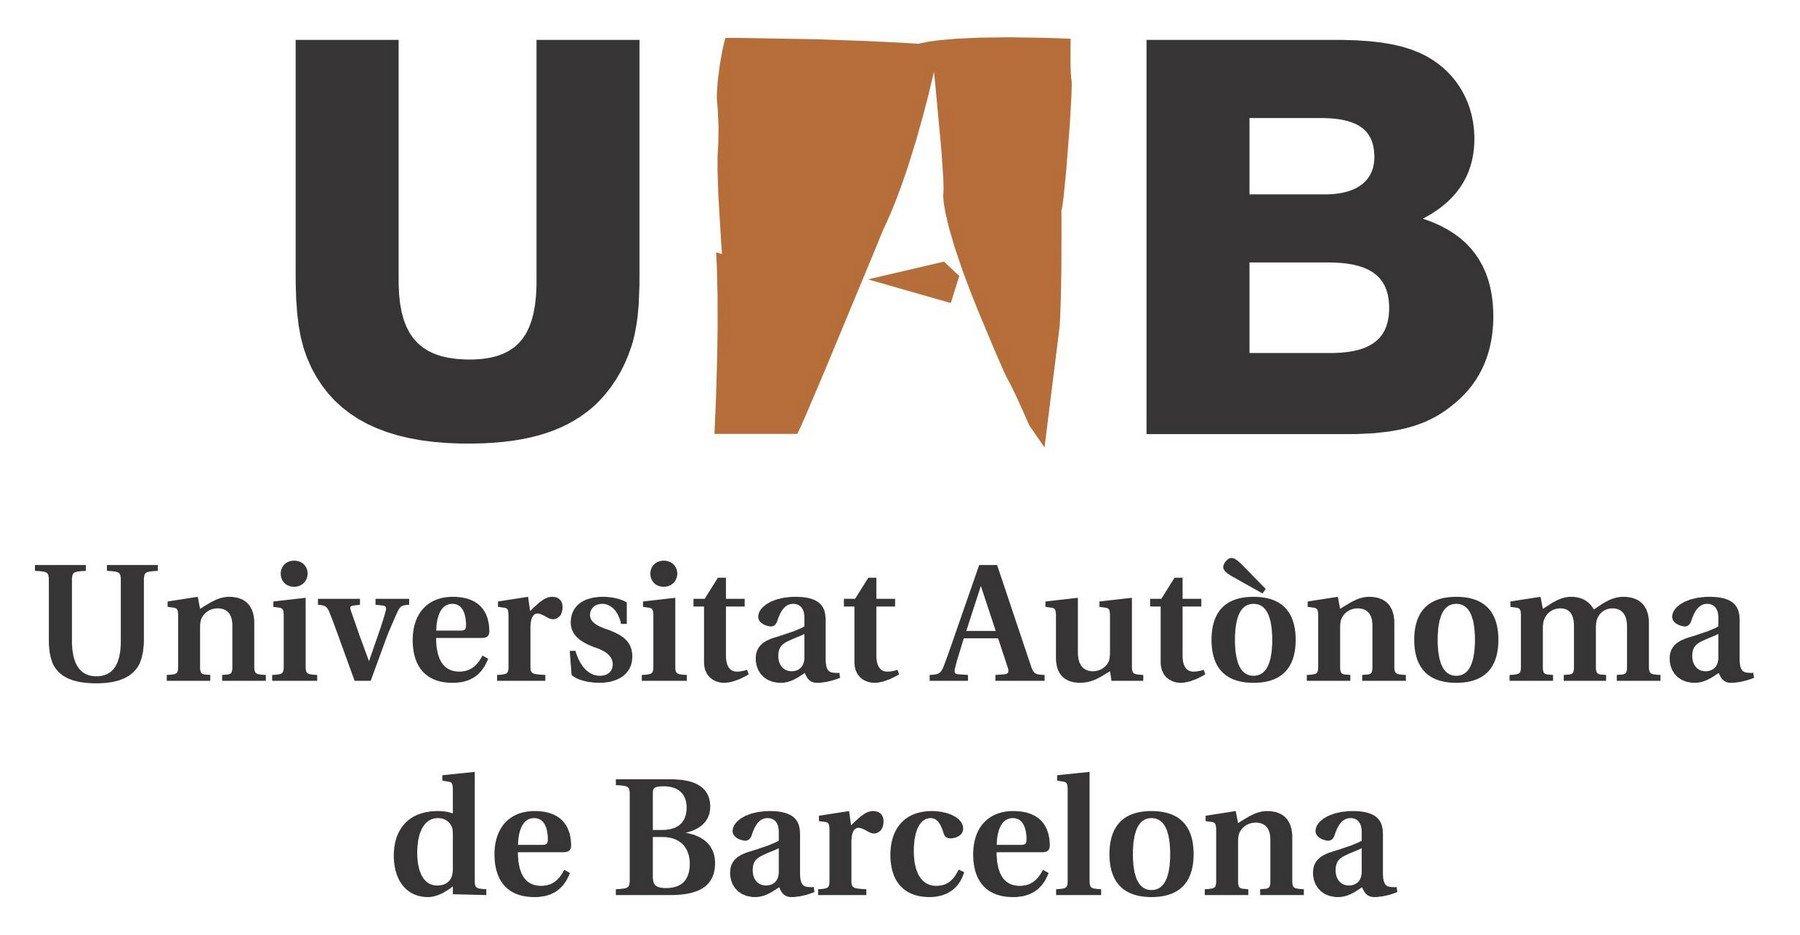 Autonomous University of Barcelona – UAB Logo [EPS File] Vector EPS Free Download, Logo, Icons,  ...